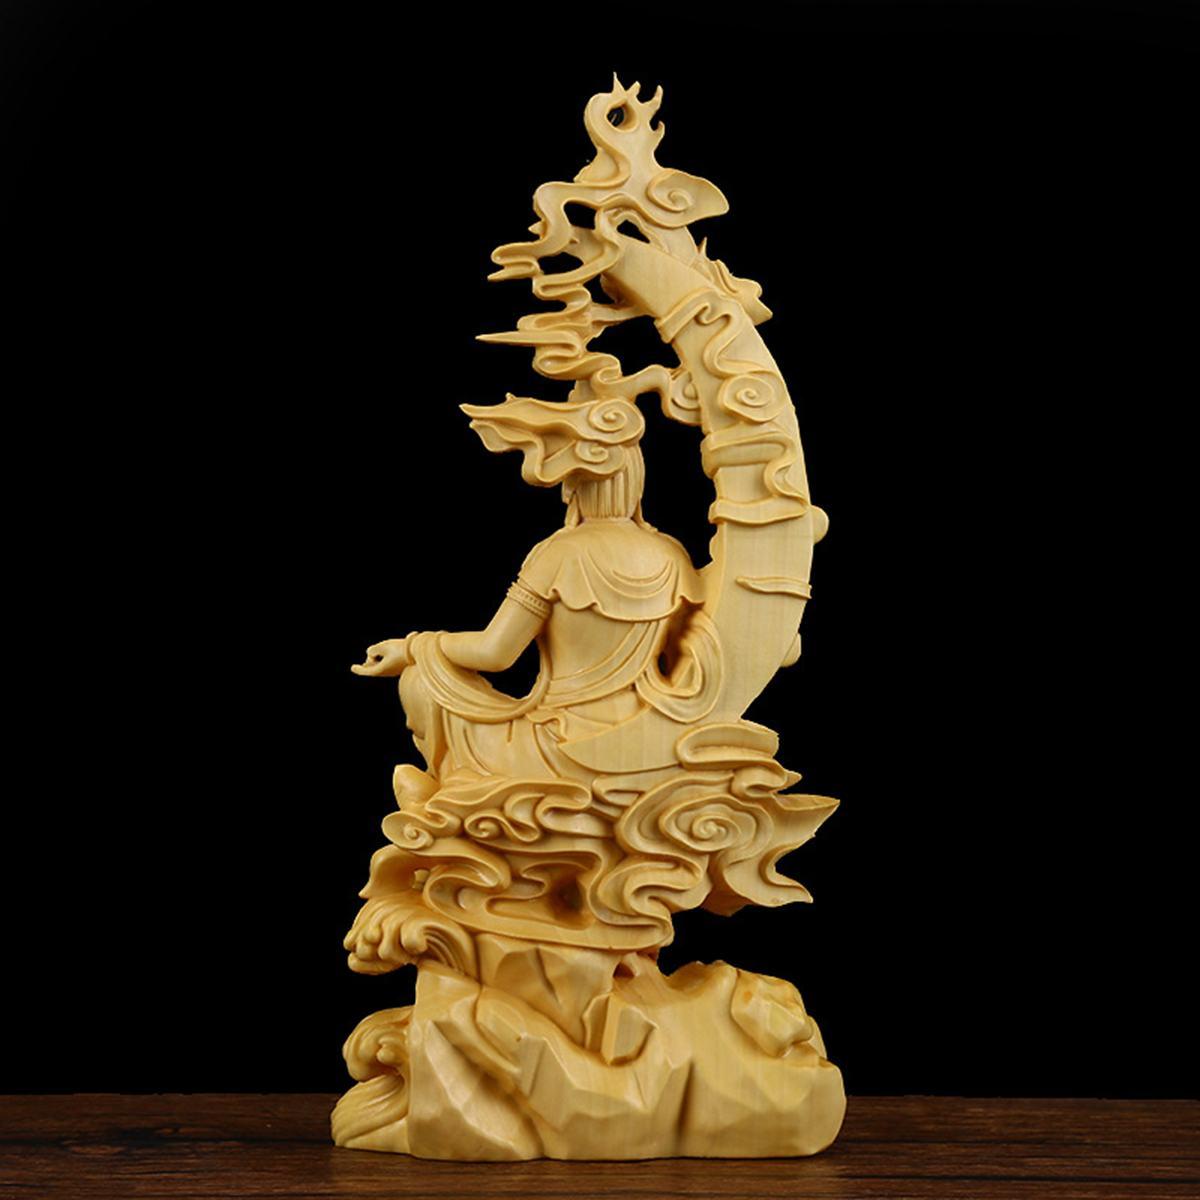 18X8.5X4CM Boxwood Wood Carving Buddha Statue Hindu Fengshui Figurine Handmade Bodhisatva Sculpture Craft Home Decoration Gifts Statues & Sculptures     - title=